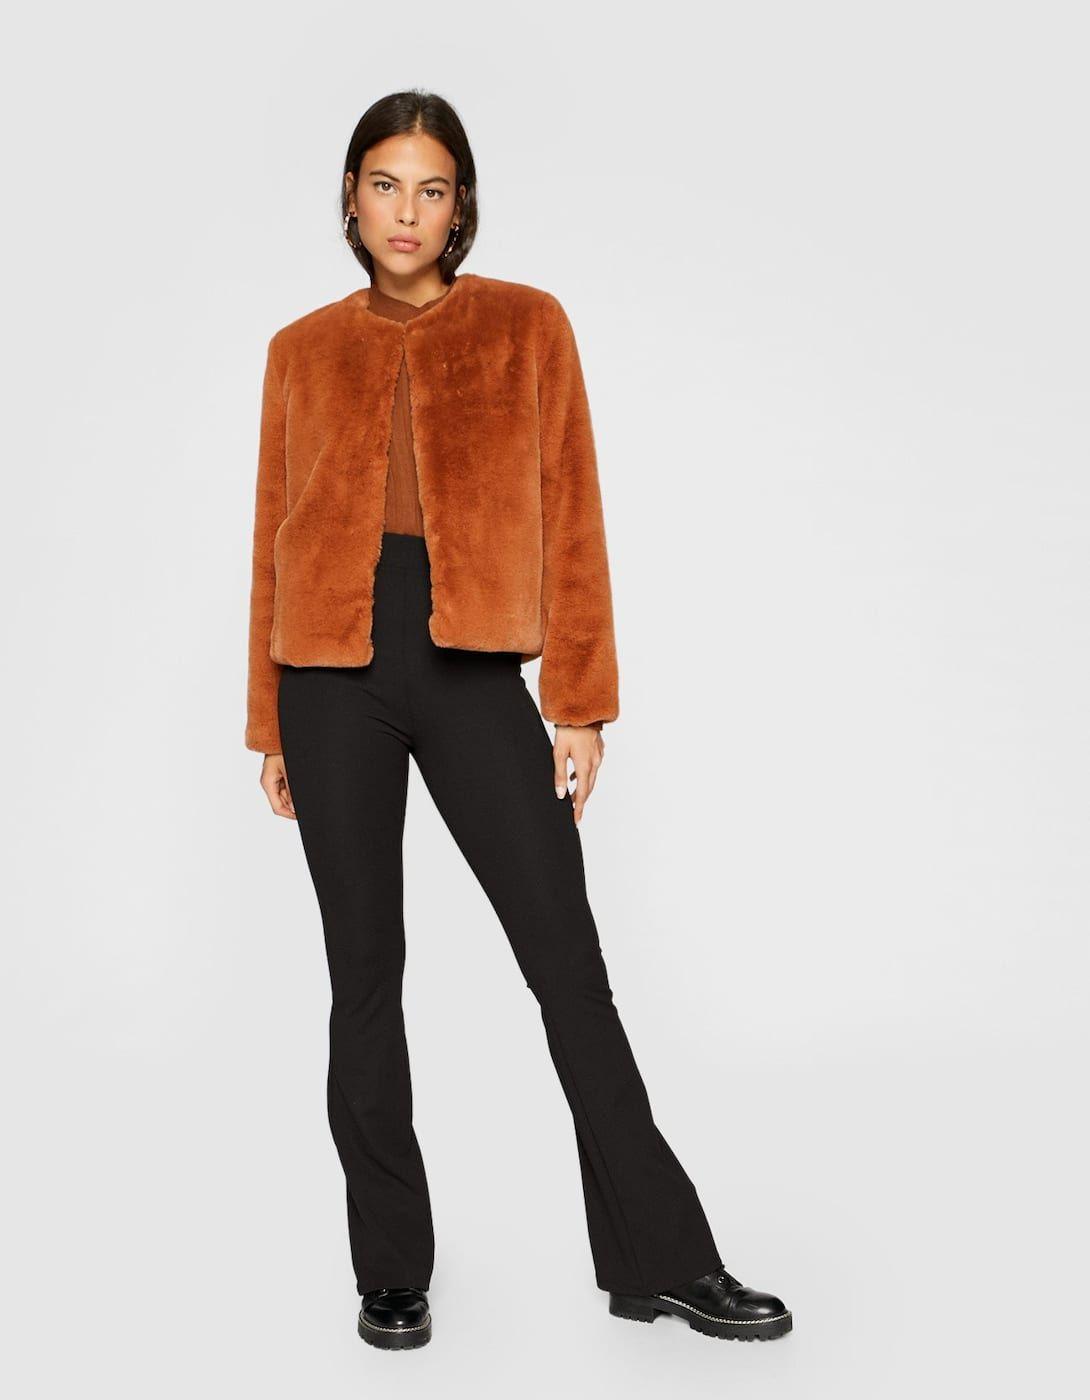 e19a9eb2221db Soft faux fur jacket | Wish list | Faux fur jacket, Fur jacket, Fashion